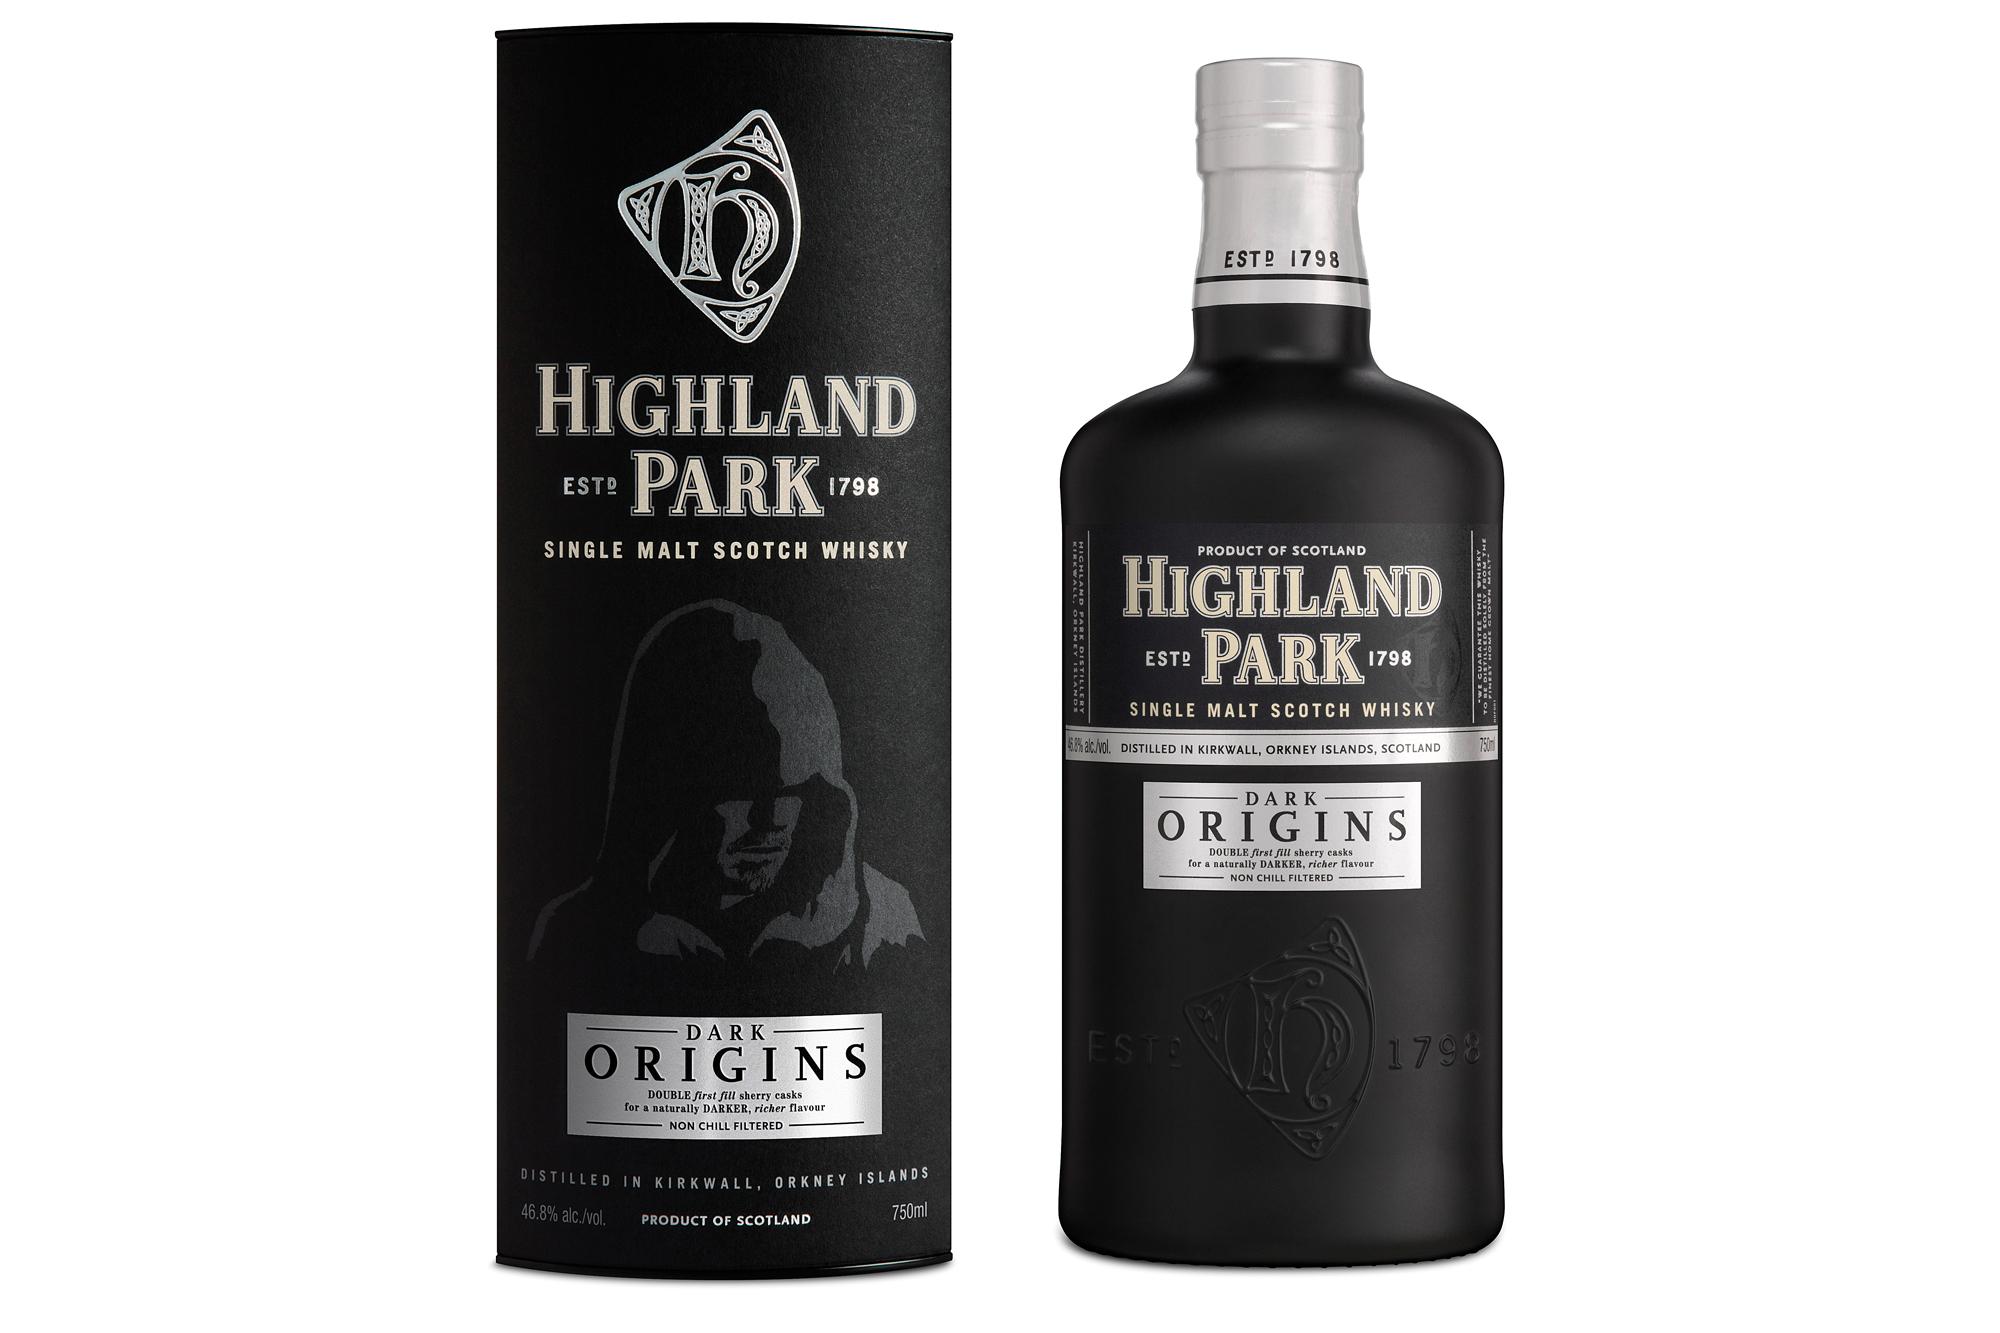 whisky preview highland park dark origins offers a new take on whisky preview highland park dark origins offers a new take on the distillery s signature style bloomberg